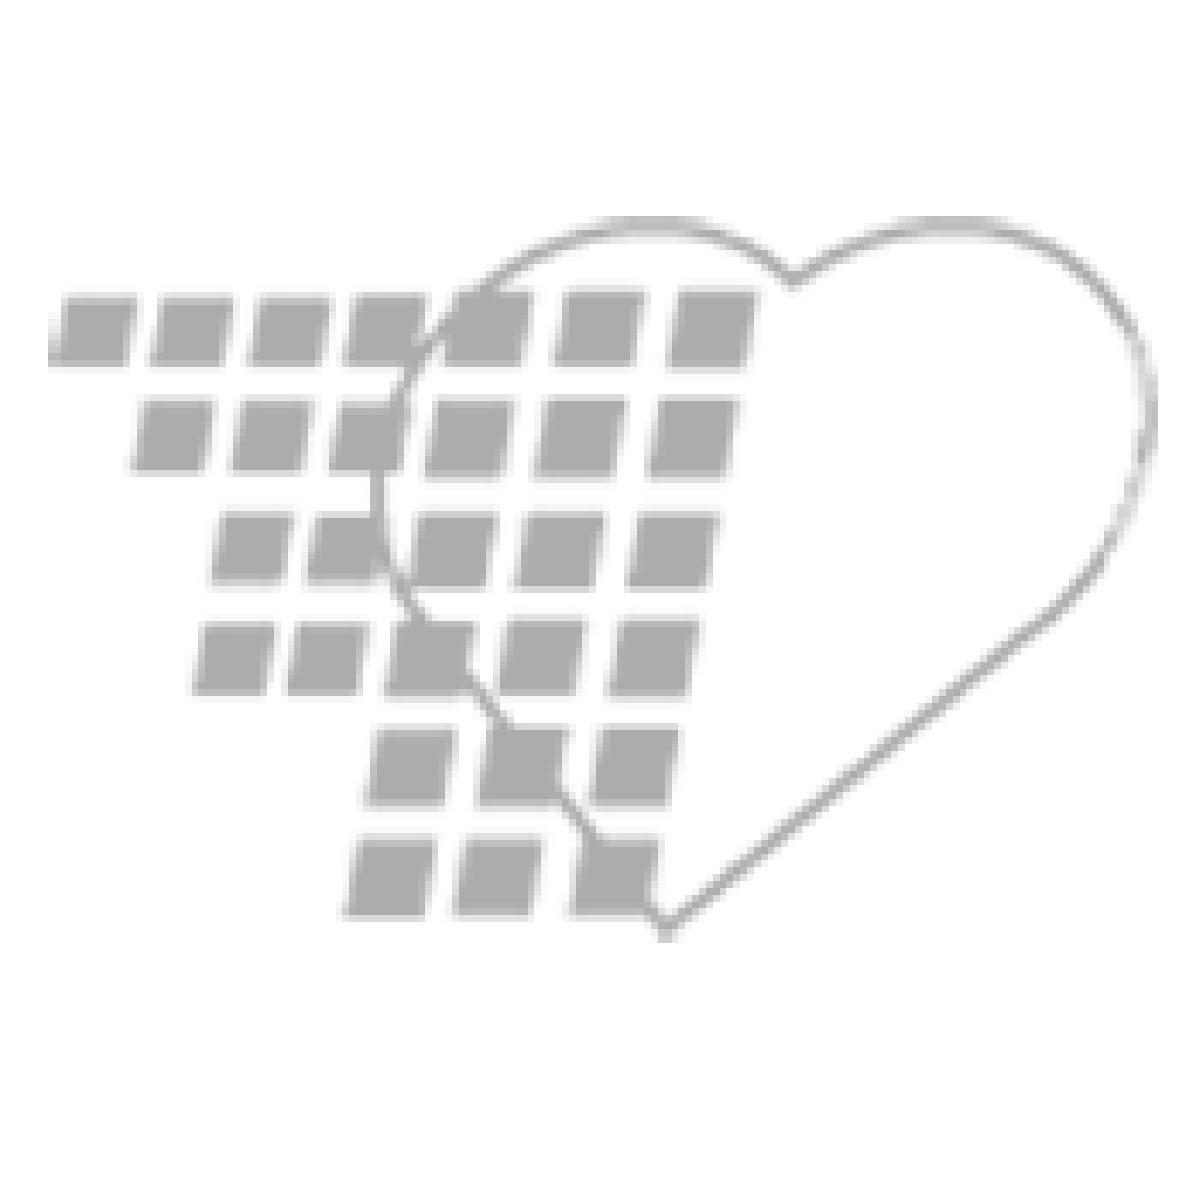 06-54-0107 - Alaris Smartsite Infusion Set